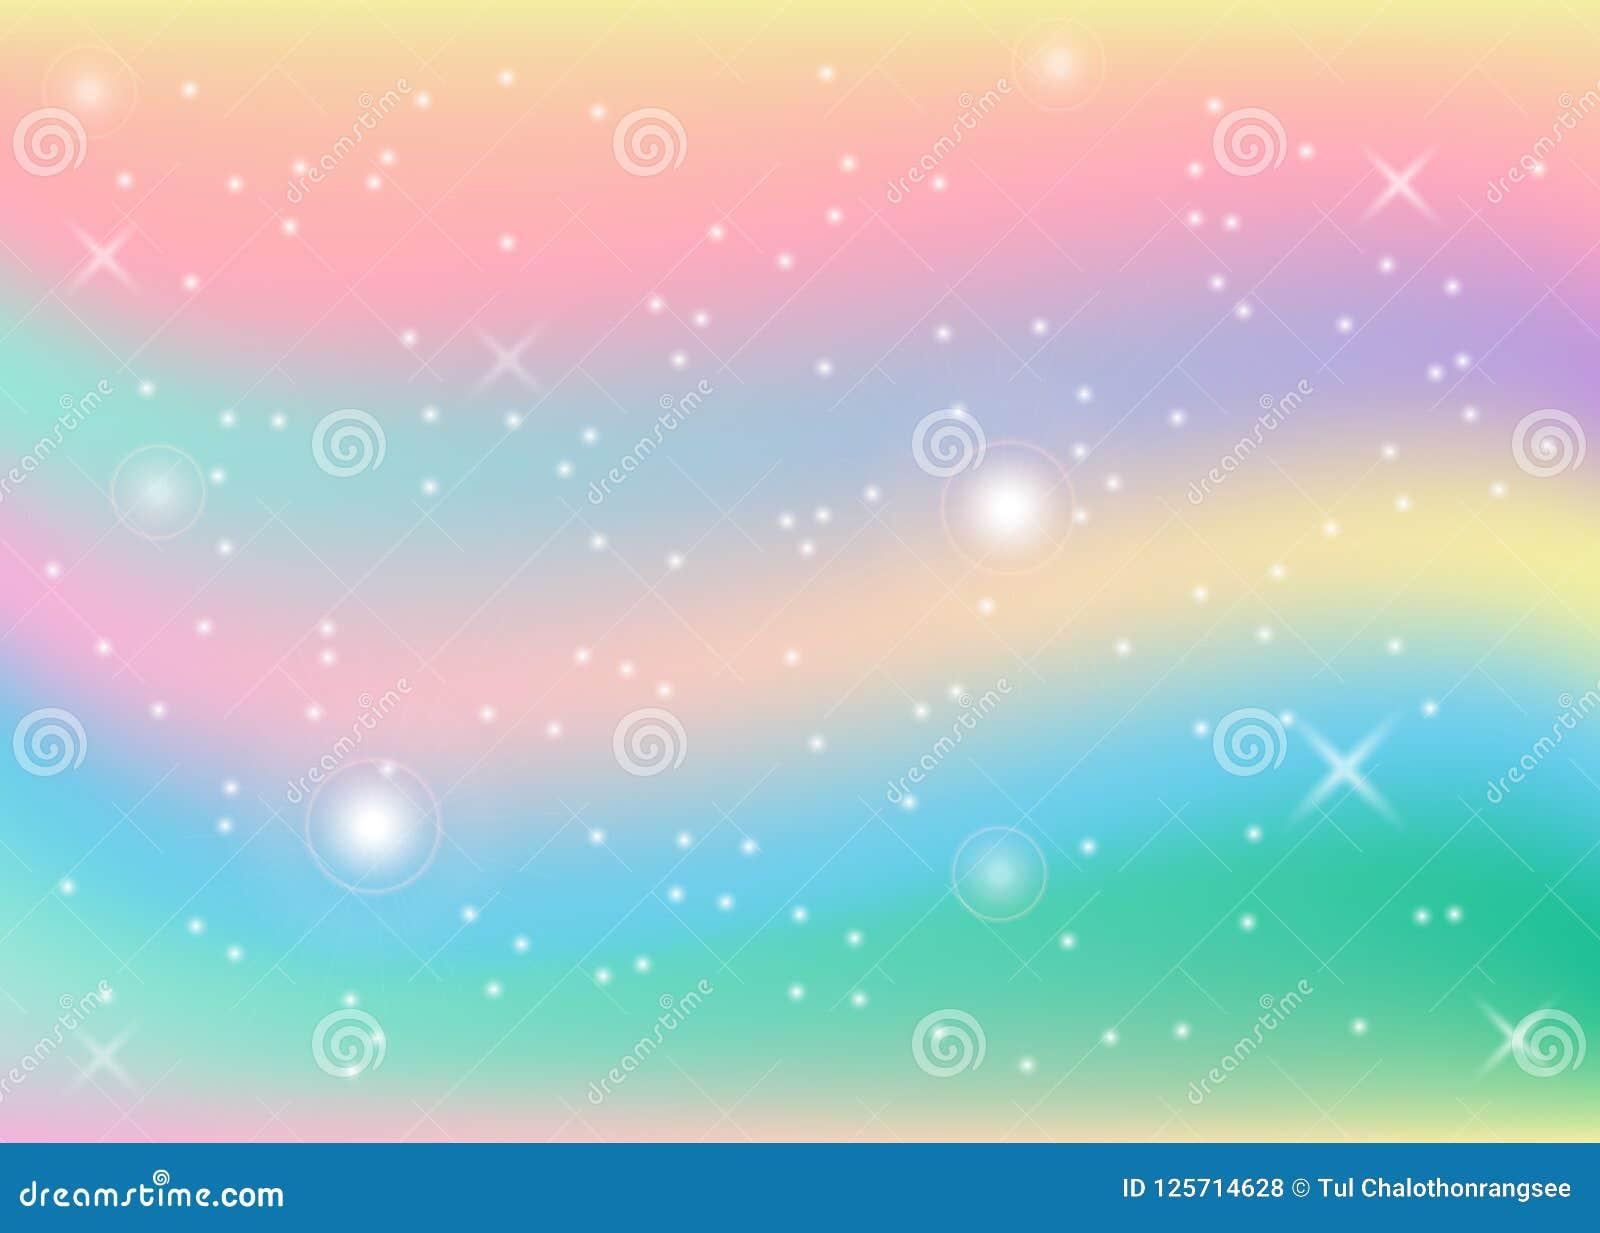 Rainbow pastel background stock vector illustration of - Rainbow background pastel ...